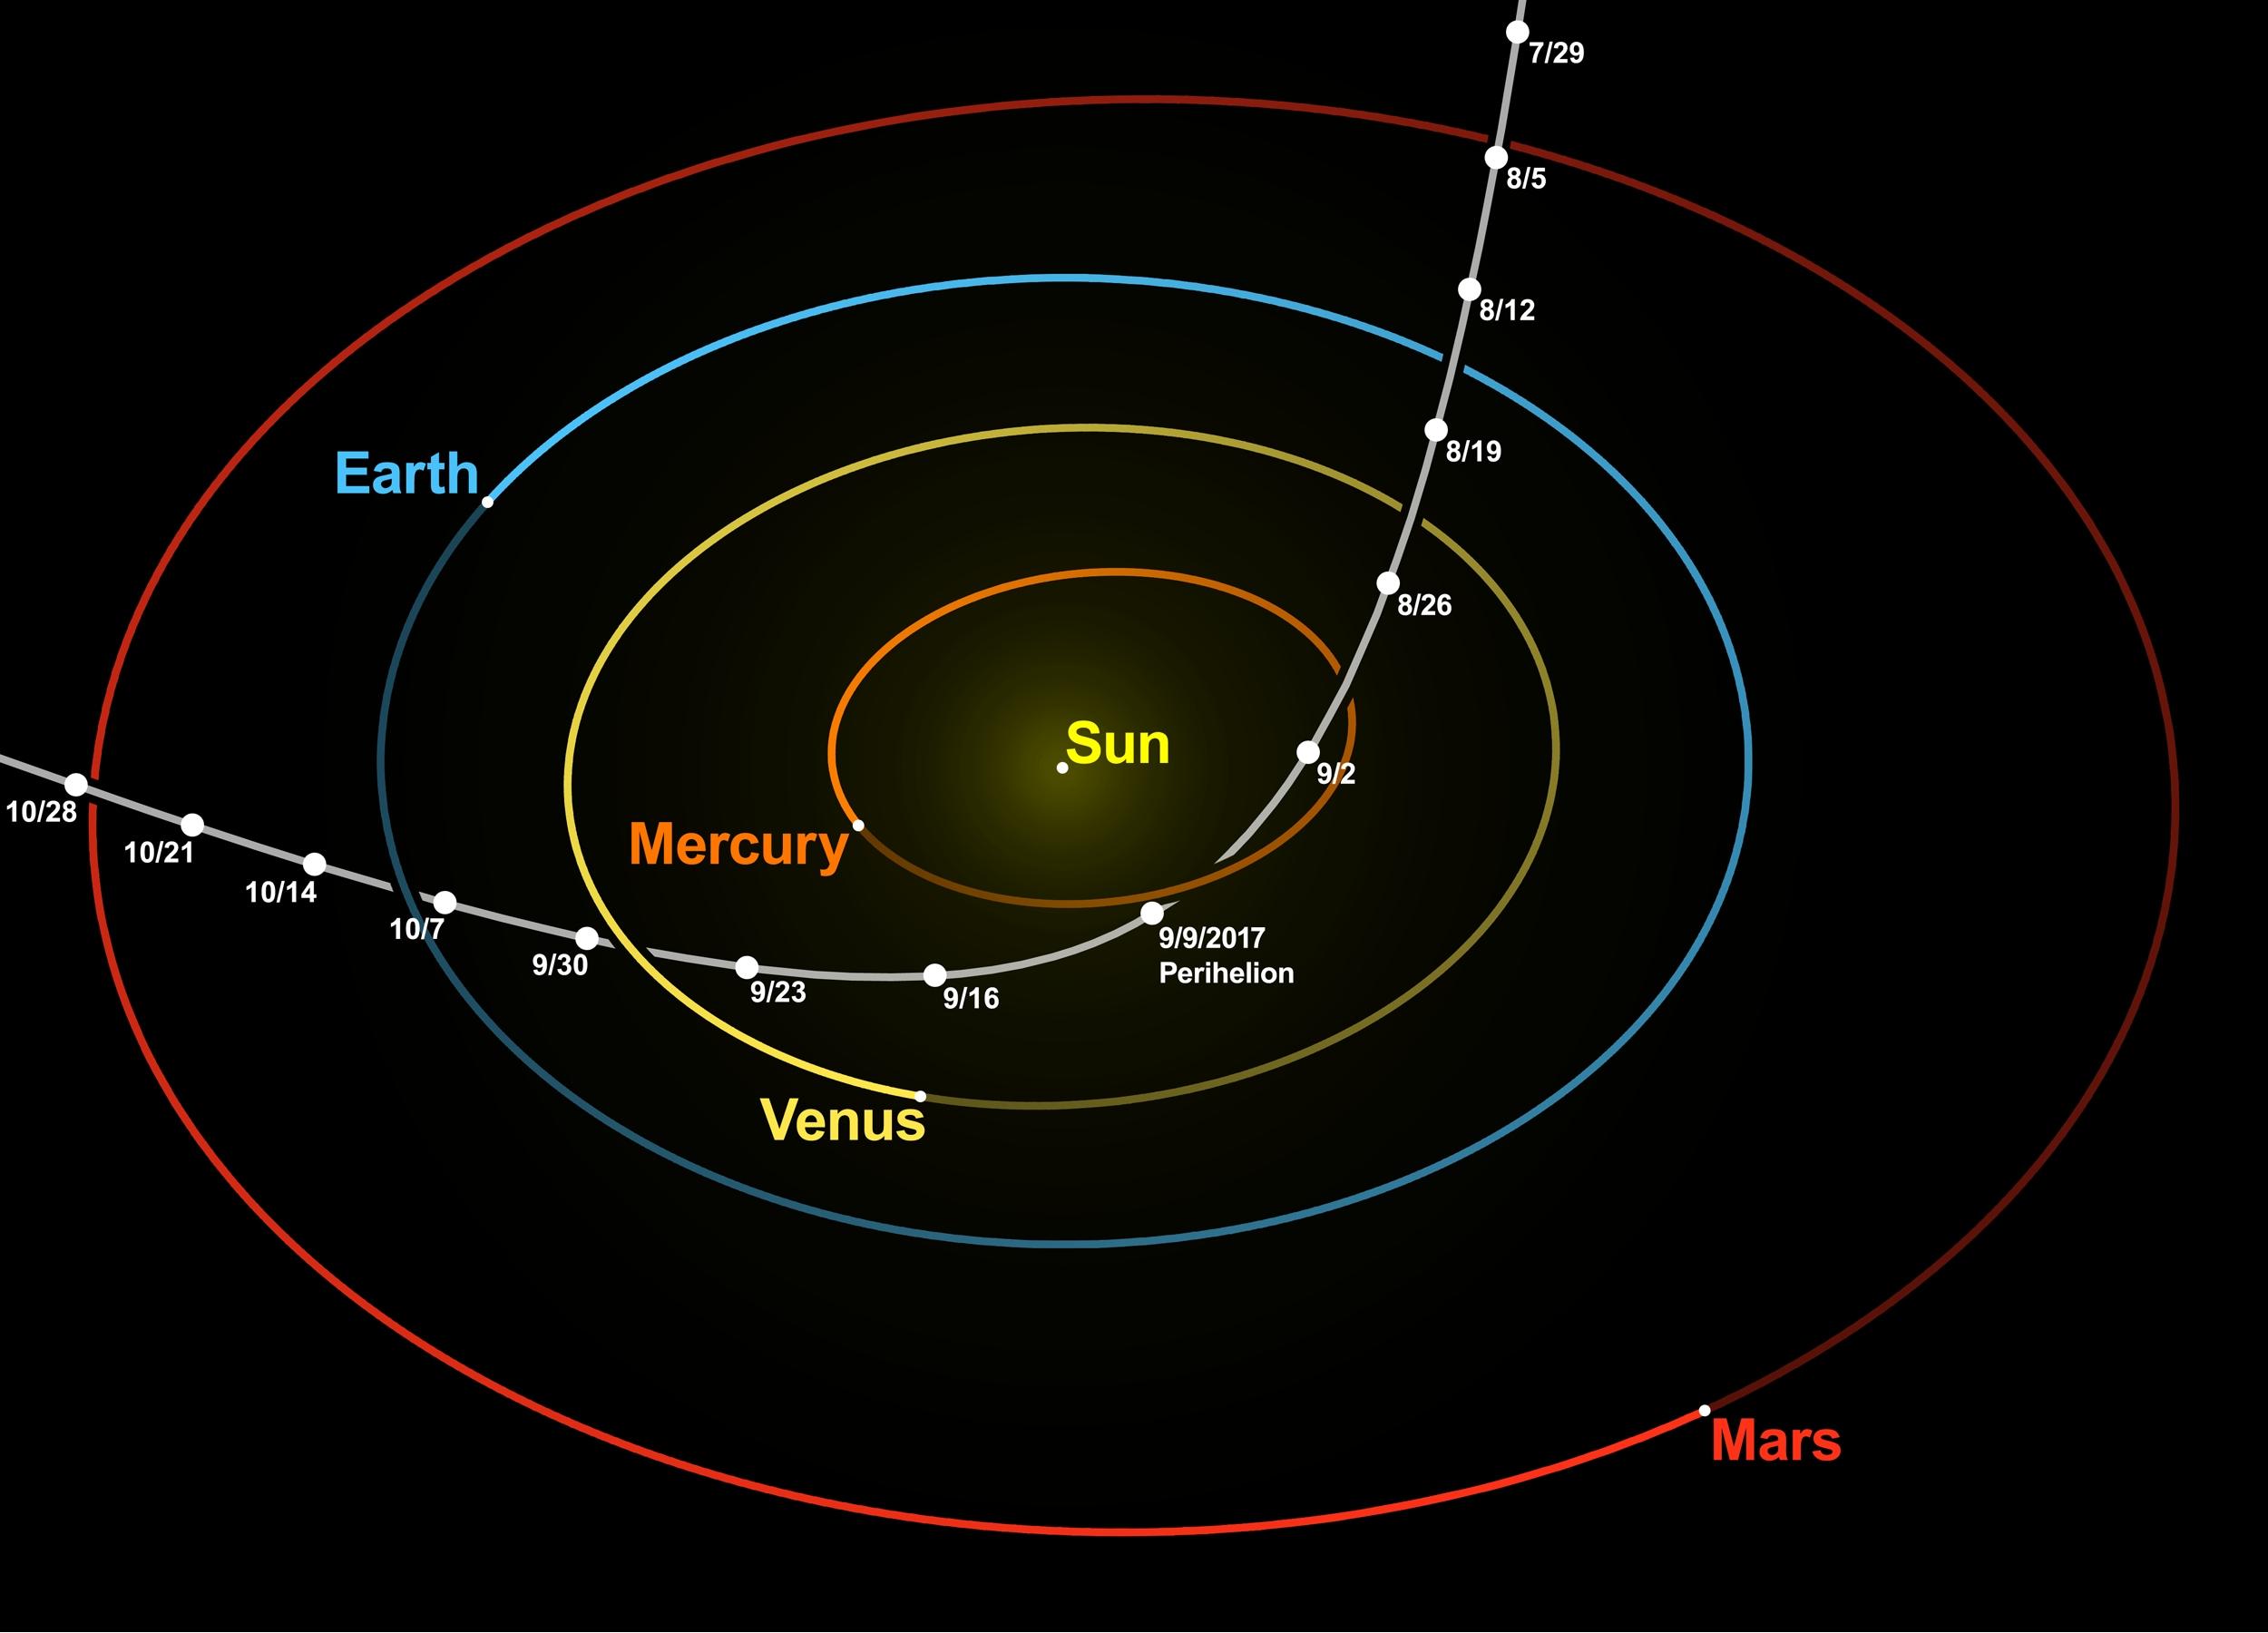 Oumuamua sigaro alieno asteroide - 1